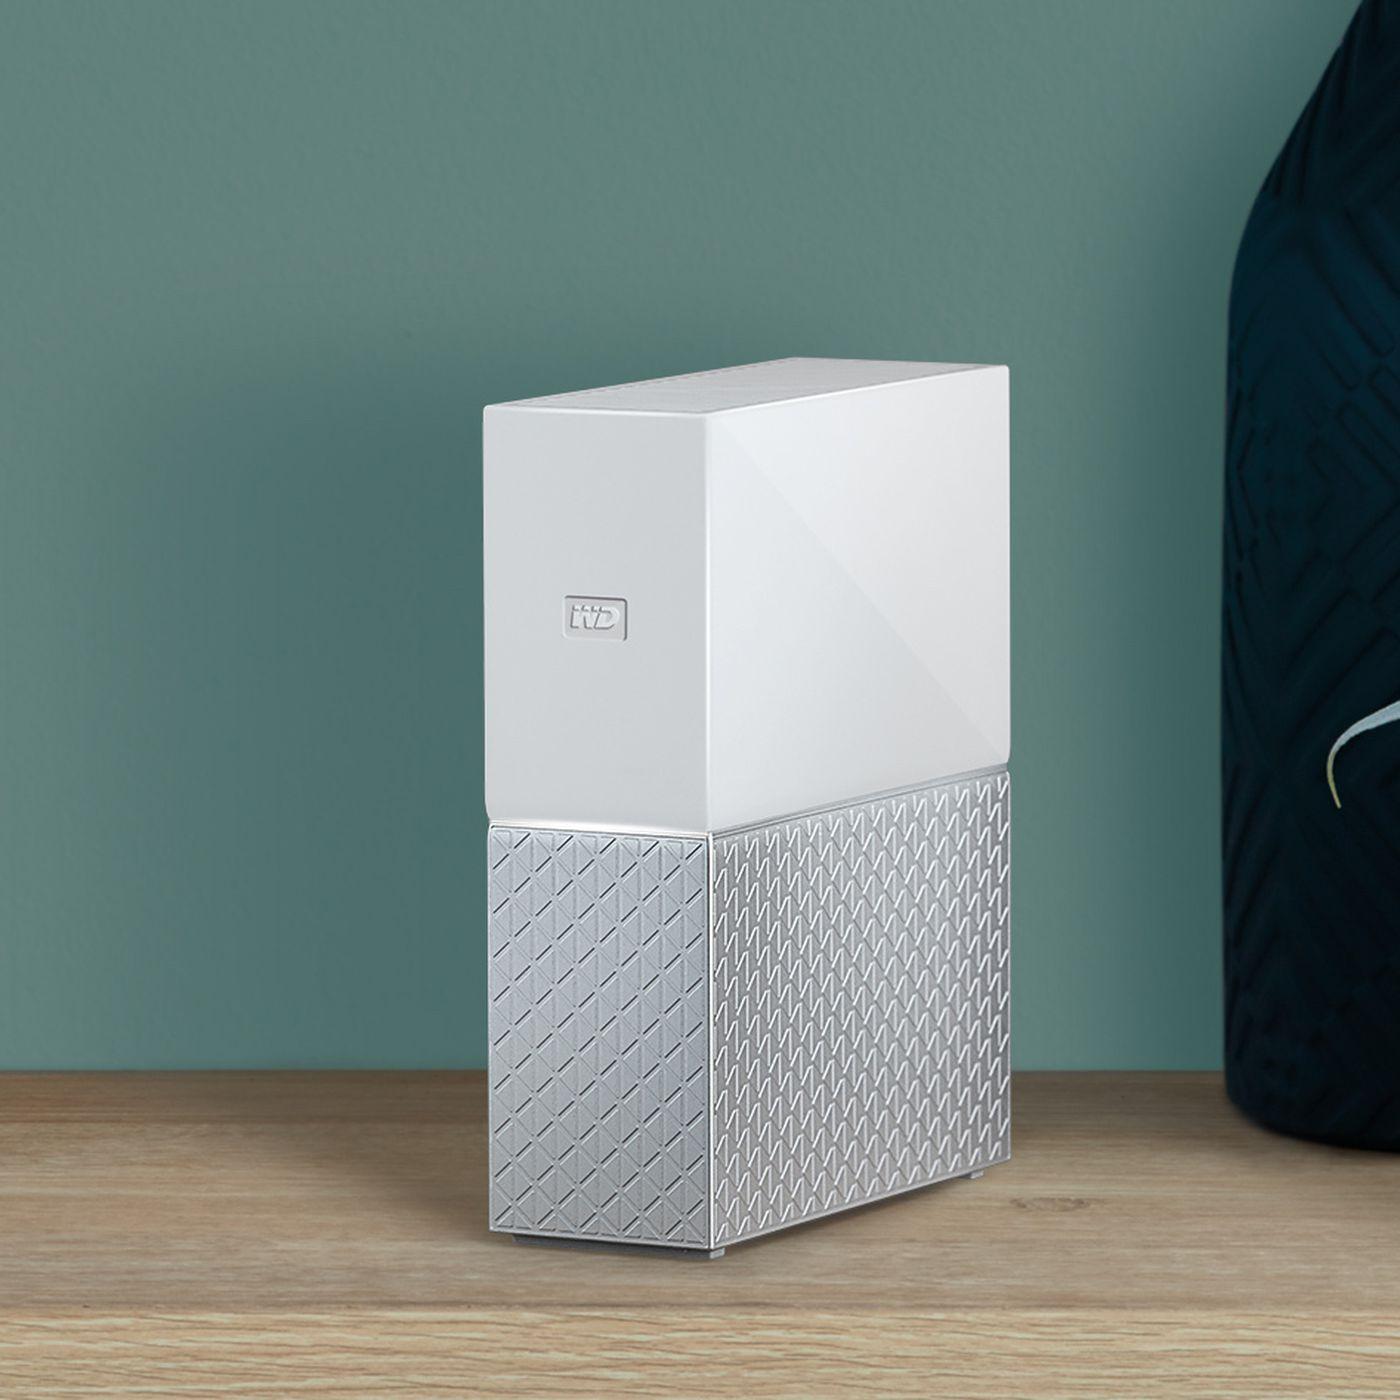 Western Digital's wireless backup drives get a better look